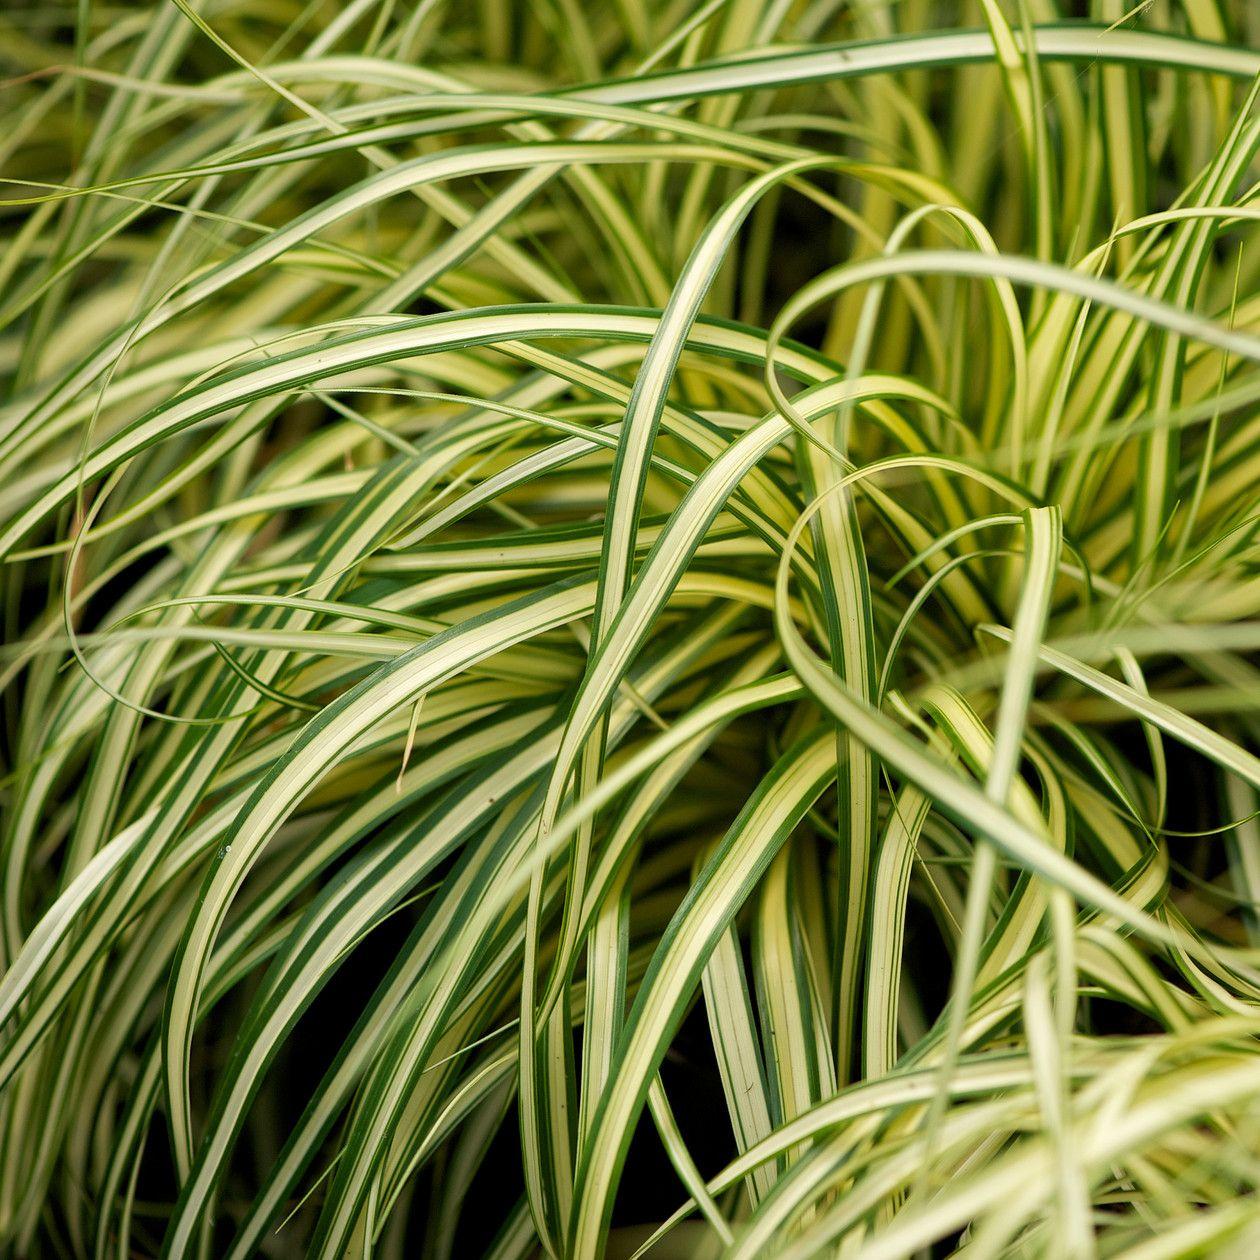 Carex oshimensis 39 evergold 39 ornamental grasses for Ornamental grass border plants